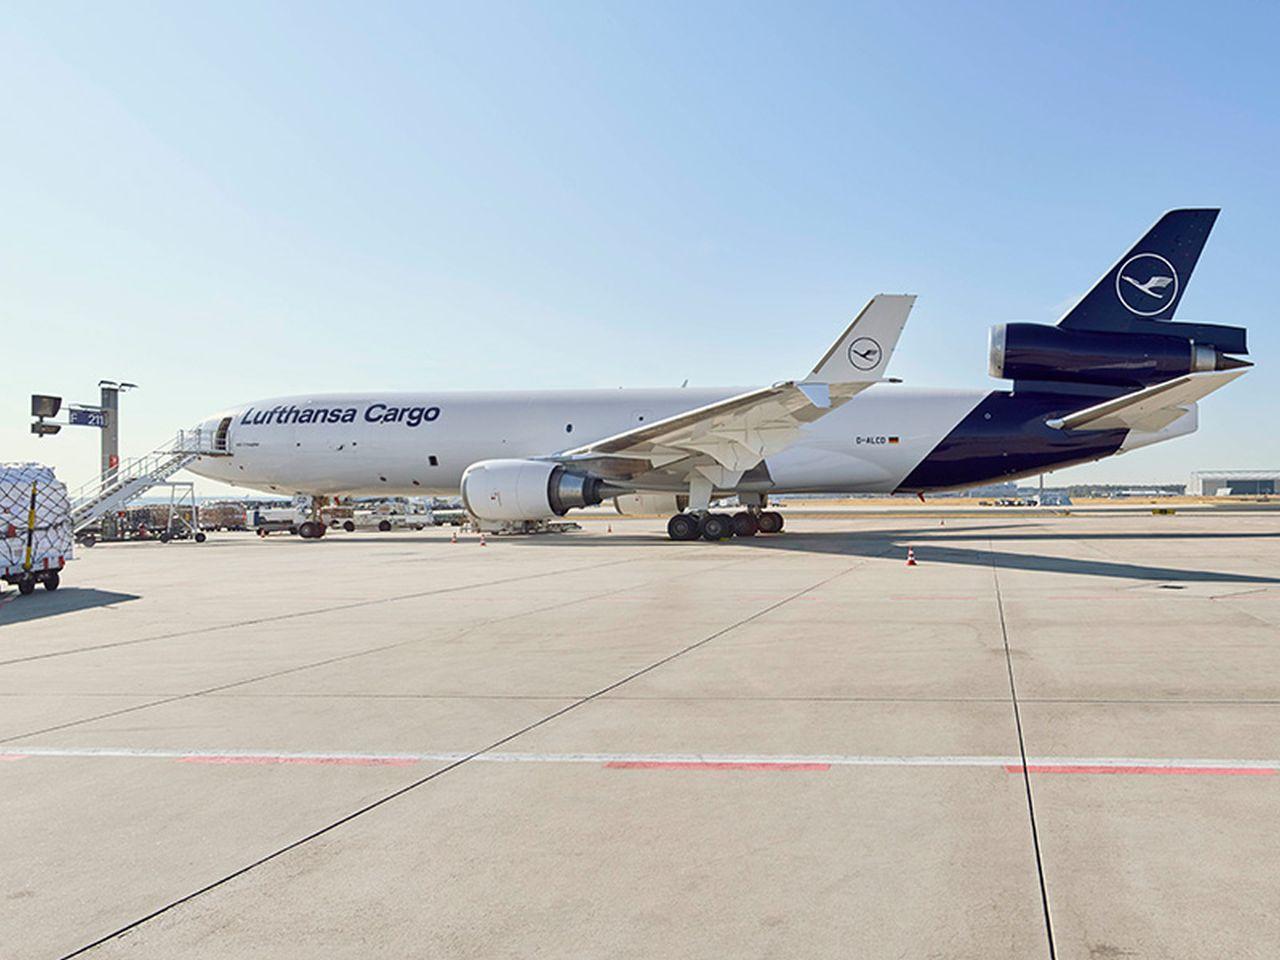 McDonell Douglas MD-11 v barvách Lufthansa Cargo. Foto: Lufthansa Cargo